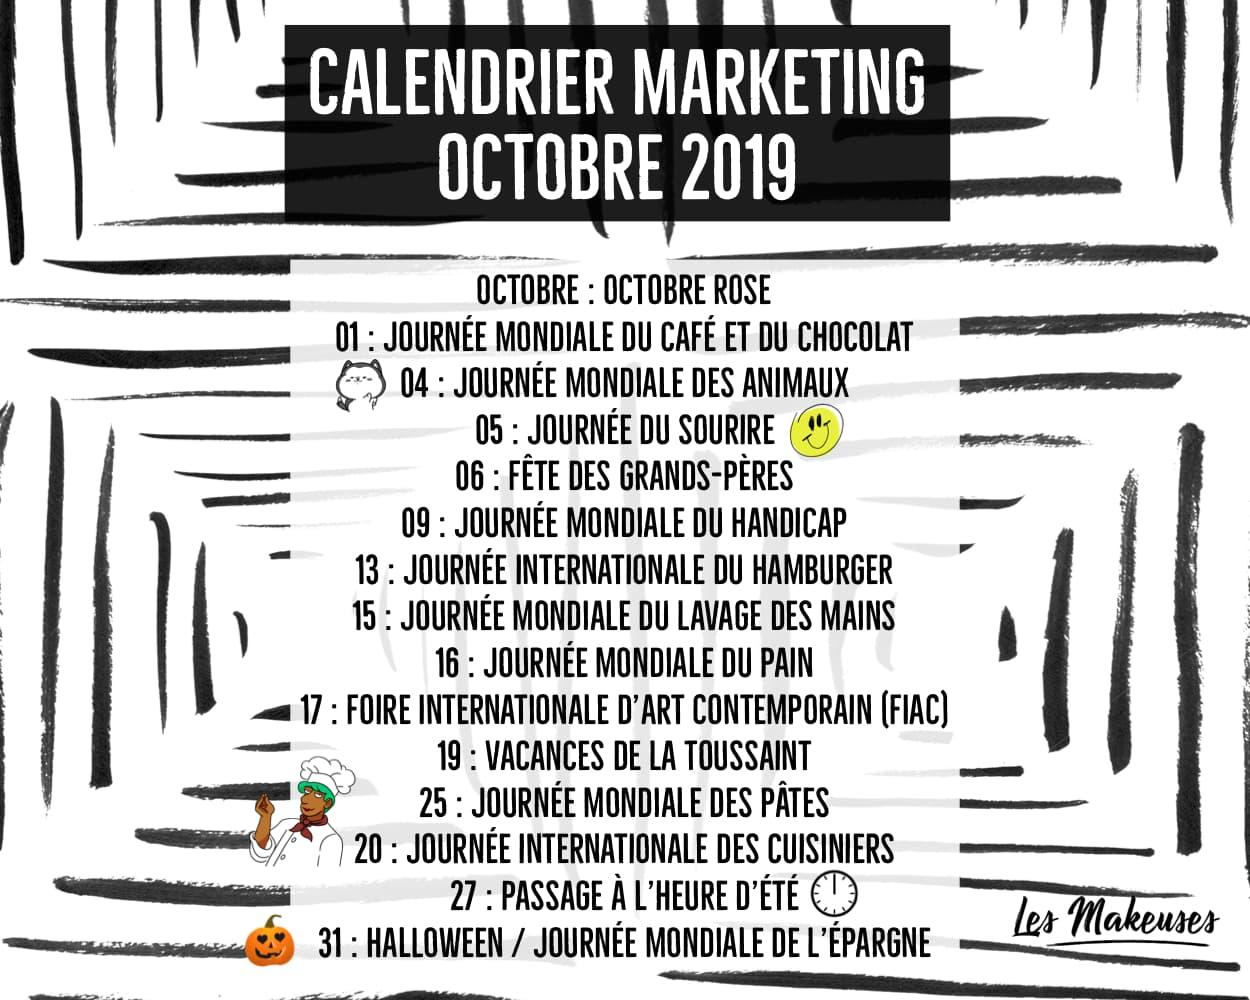 Petit Calendrier 2019.Calendrier Marketing Octobre 2019 Les Makeuses